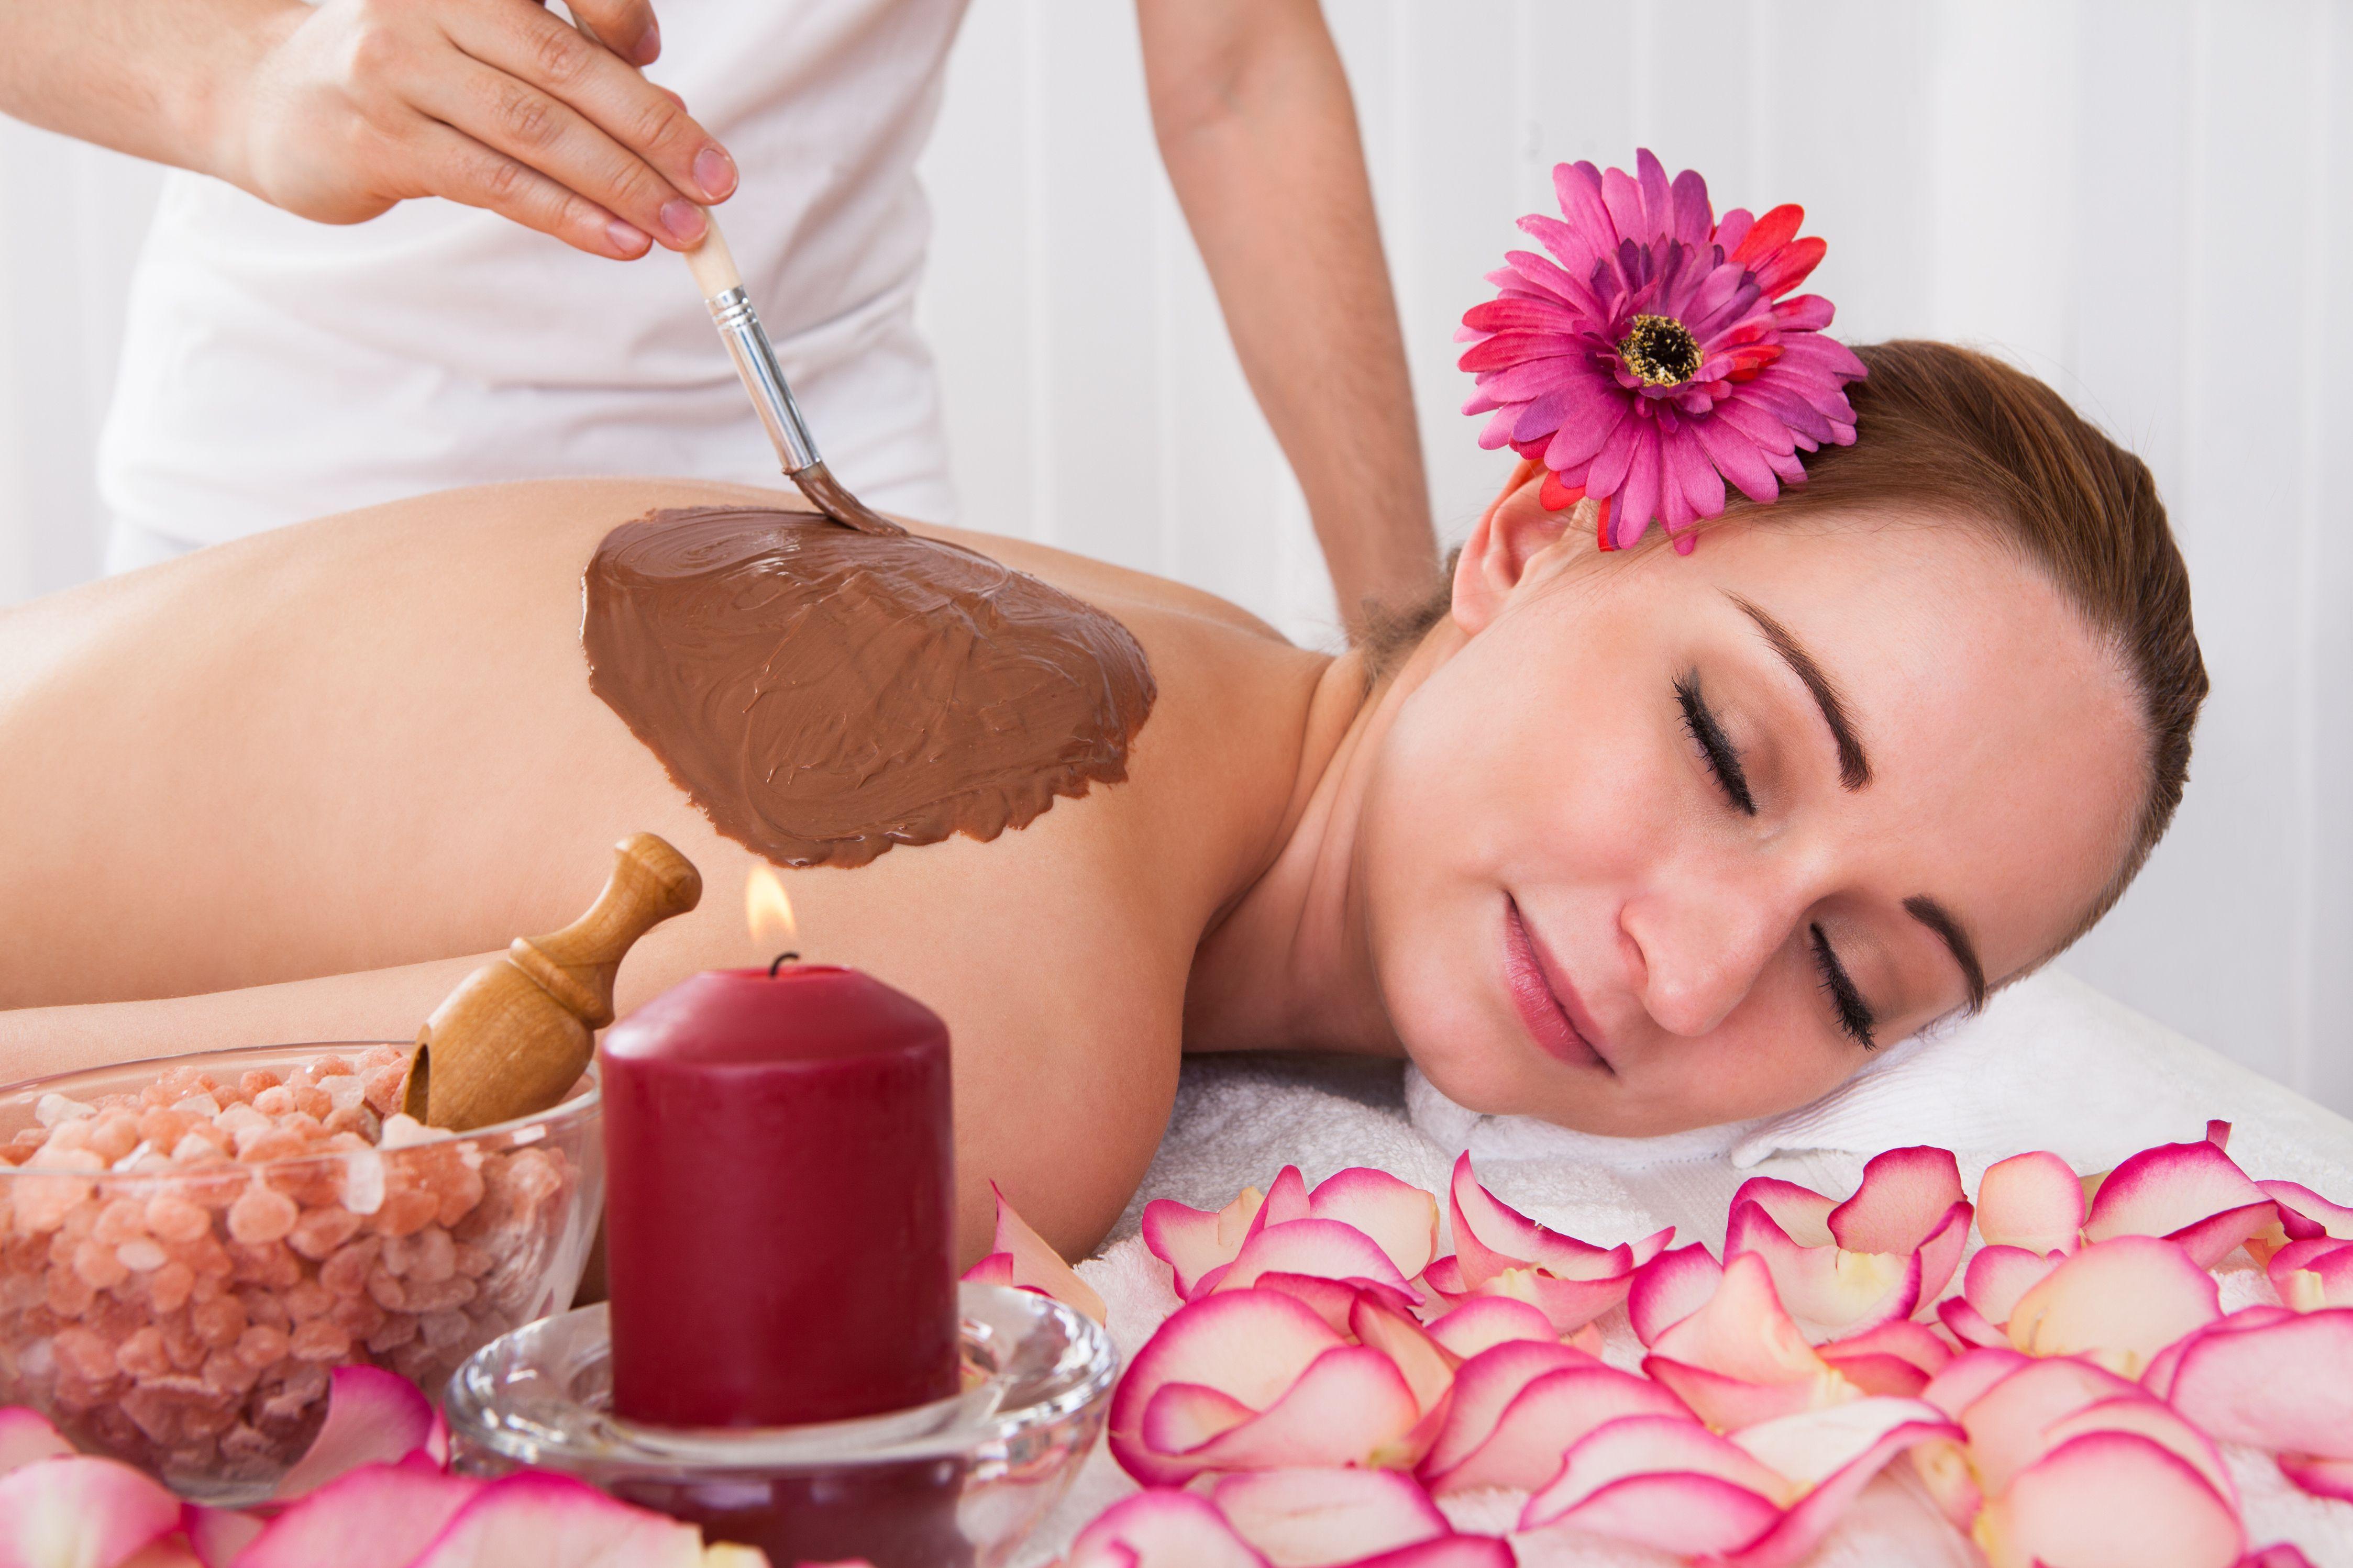 Tratamientos corporales: Servicios de Centro de Estética Skeyndor Ana Pereira